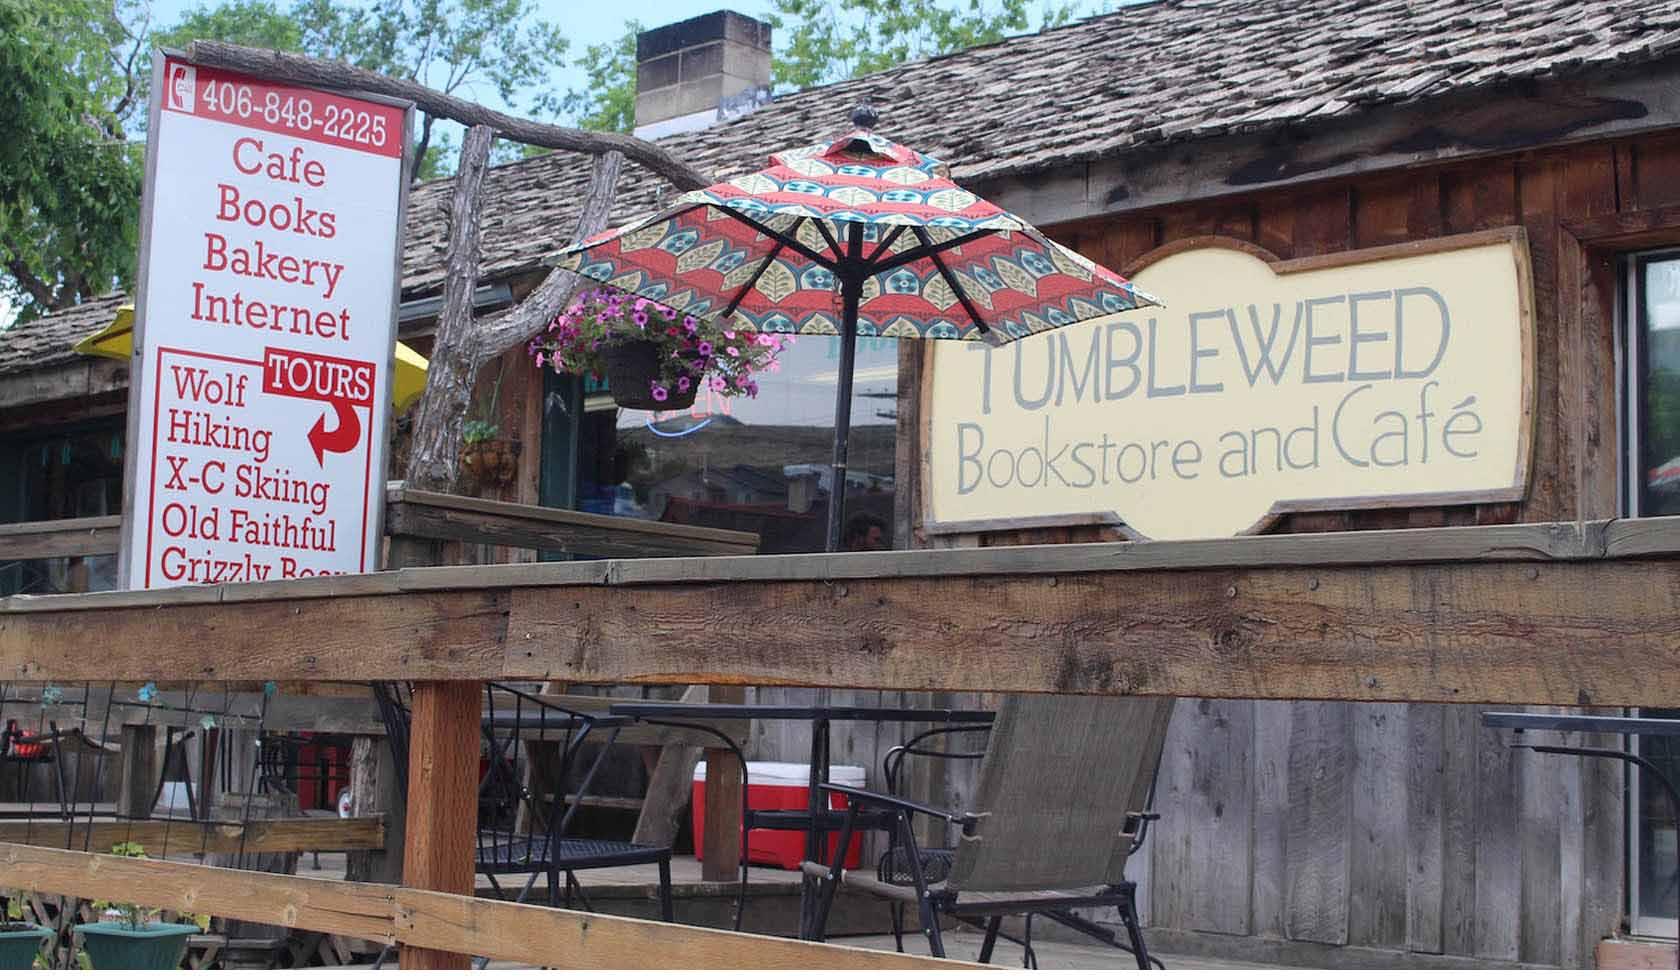 Tumbleweed Bookstore and Cafe profile image